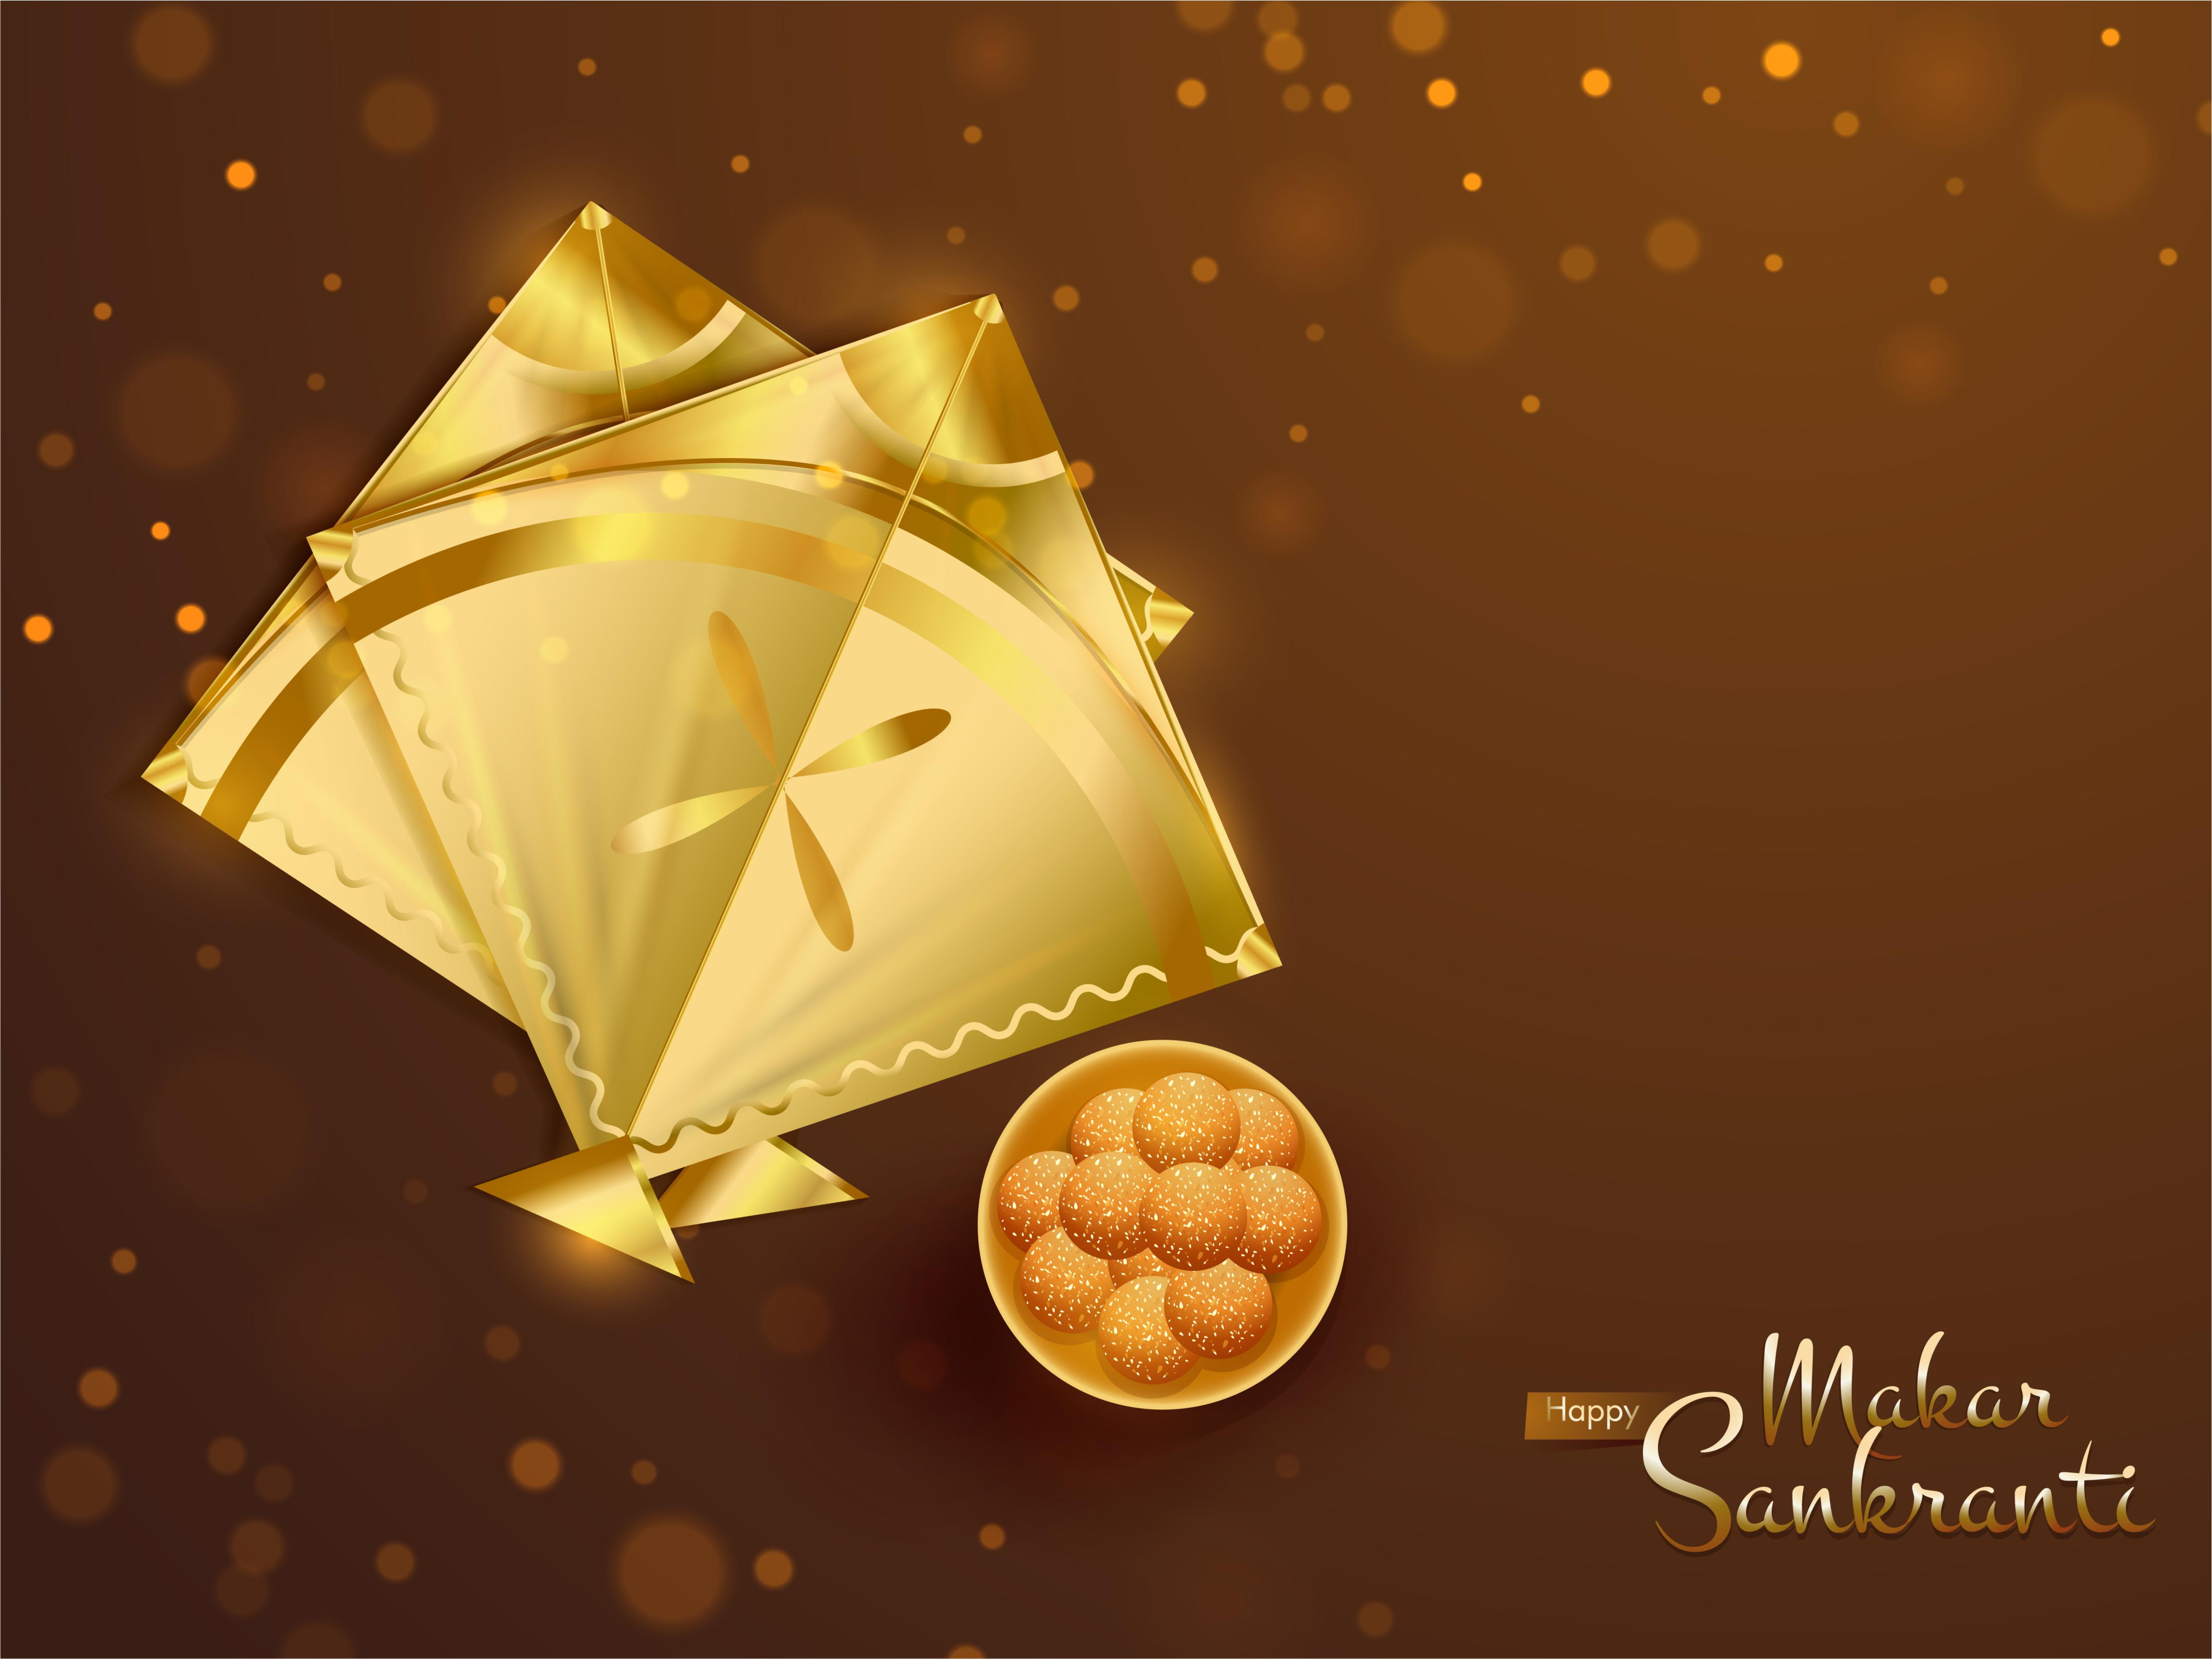 Unique Gift Ideas for Makar Sankranti